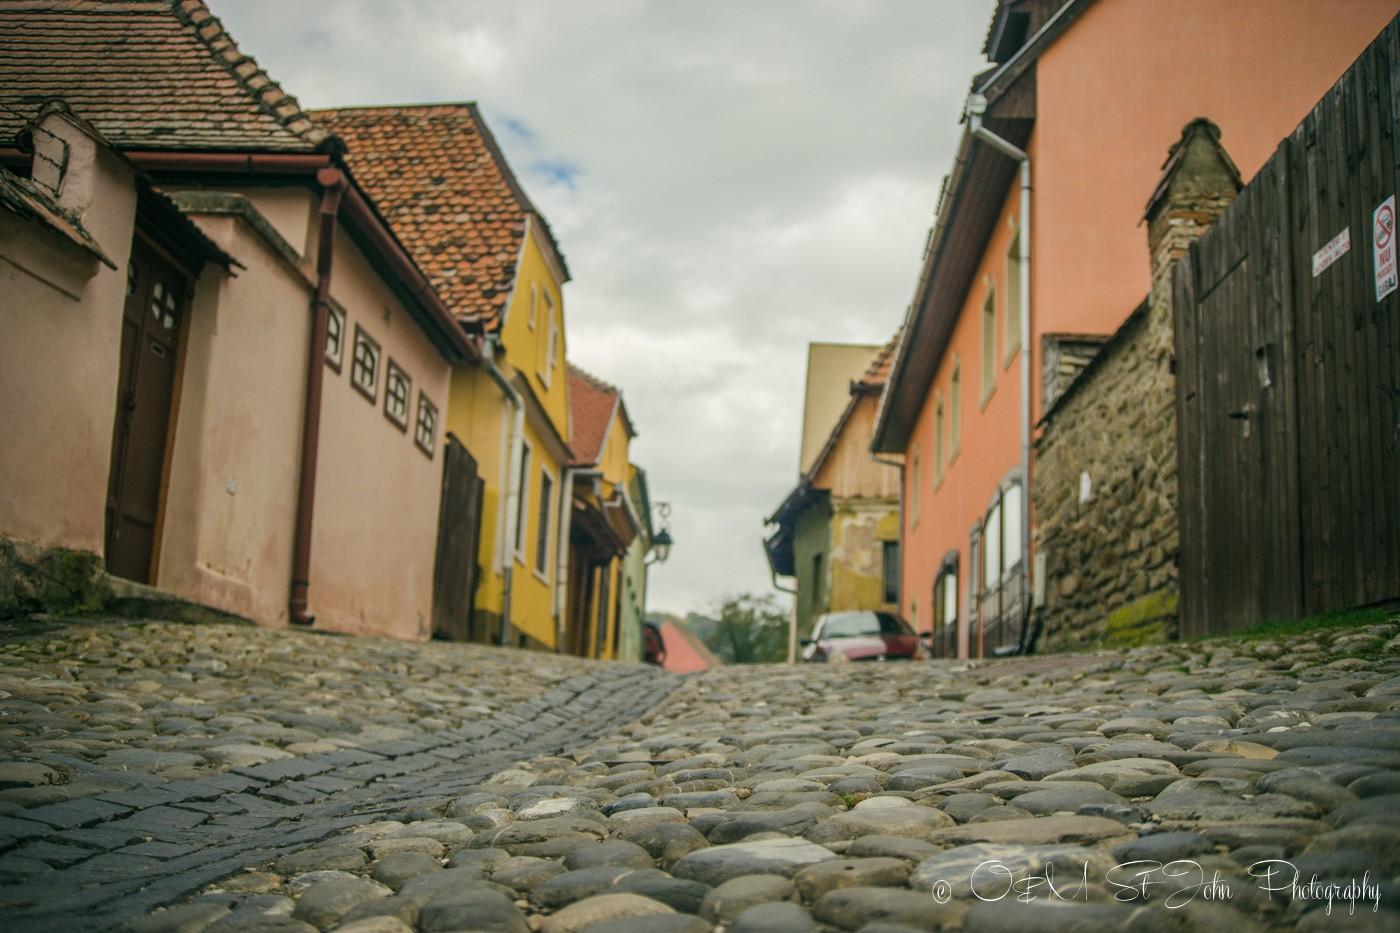 Cobblestone street in Sighisoara, Romania